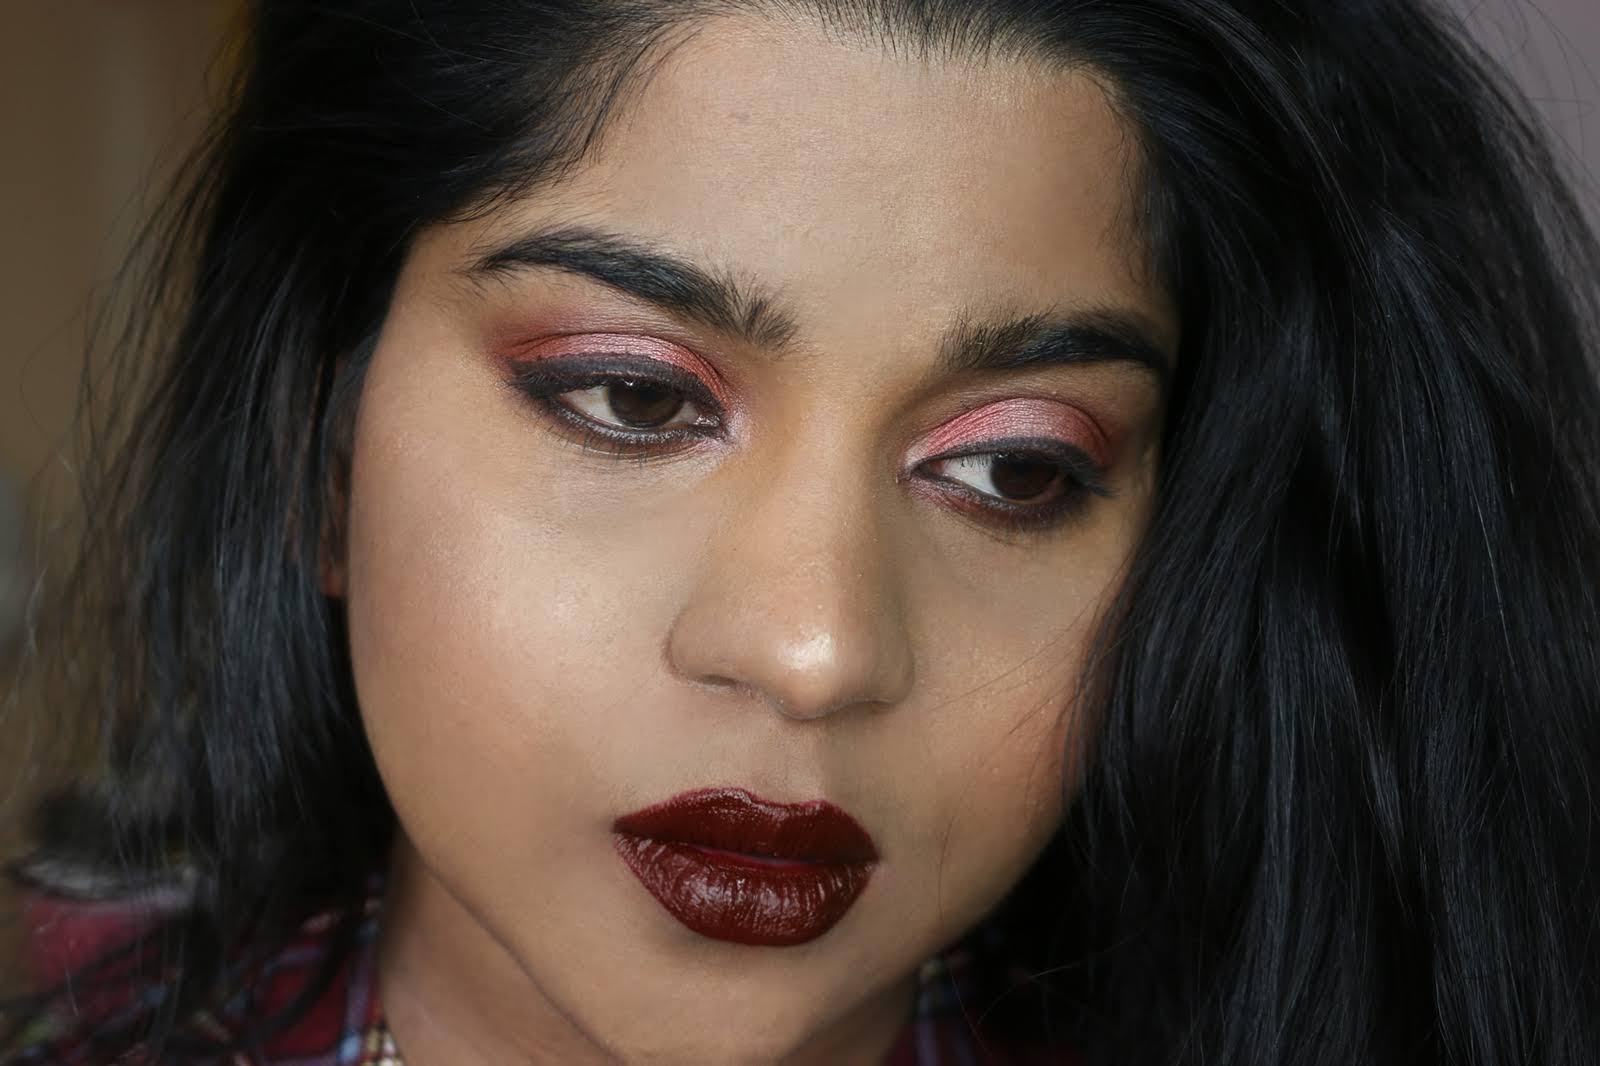 pat mcgrath mattetrance lipstick mc menamy, pat mcgrath mc menamy, pat mcgrath mc menamy review, pat mcgrath mattetrance lipstick mc menamy review, pat mcgrath labs mattetrance lipstick mc menamy review, pat mcgrath lipstick mc menamy swatches, patmcgrath matte trance lipstick mc menamy swatches